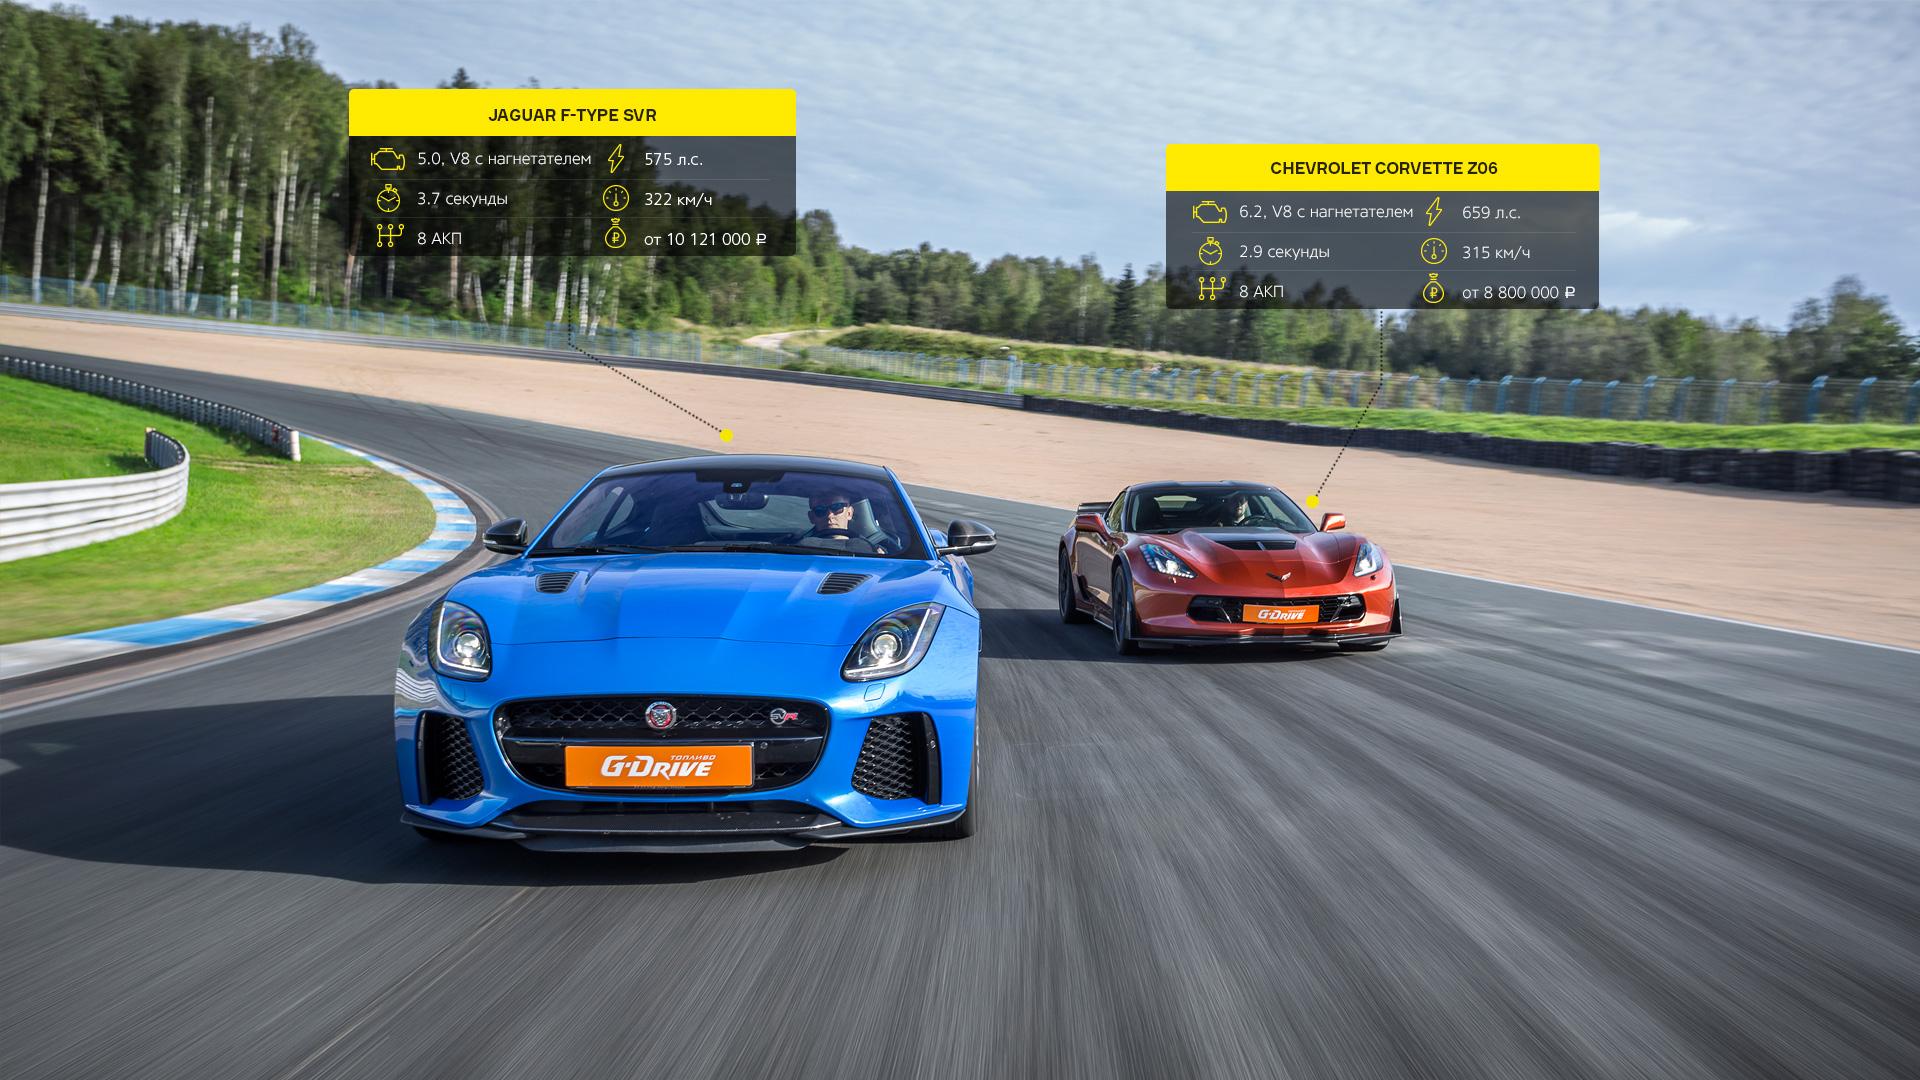 Битва года: Jaguar F-Type SVR vsChevrolet Corvette Z06. Фото 9